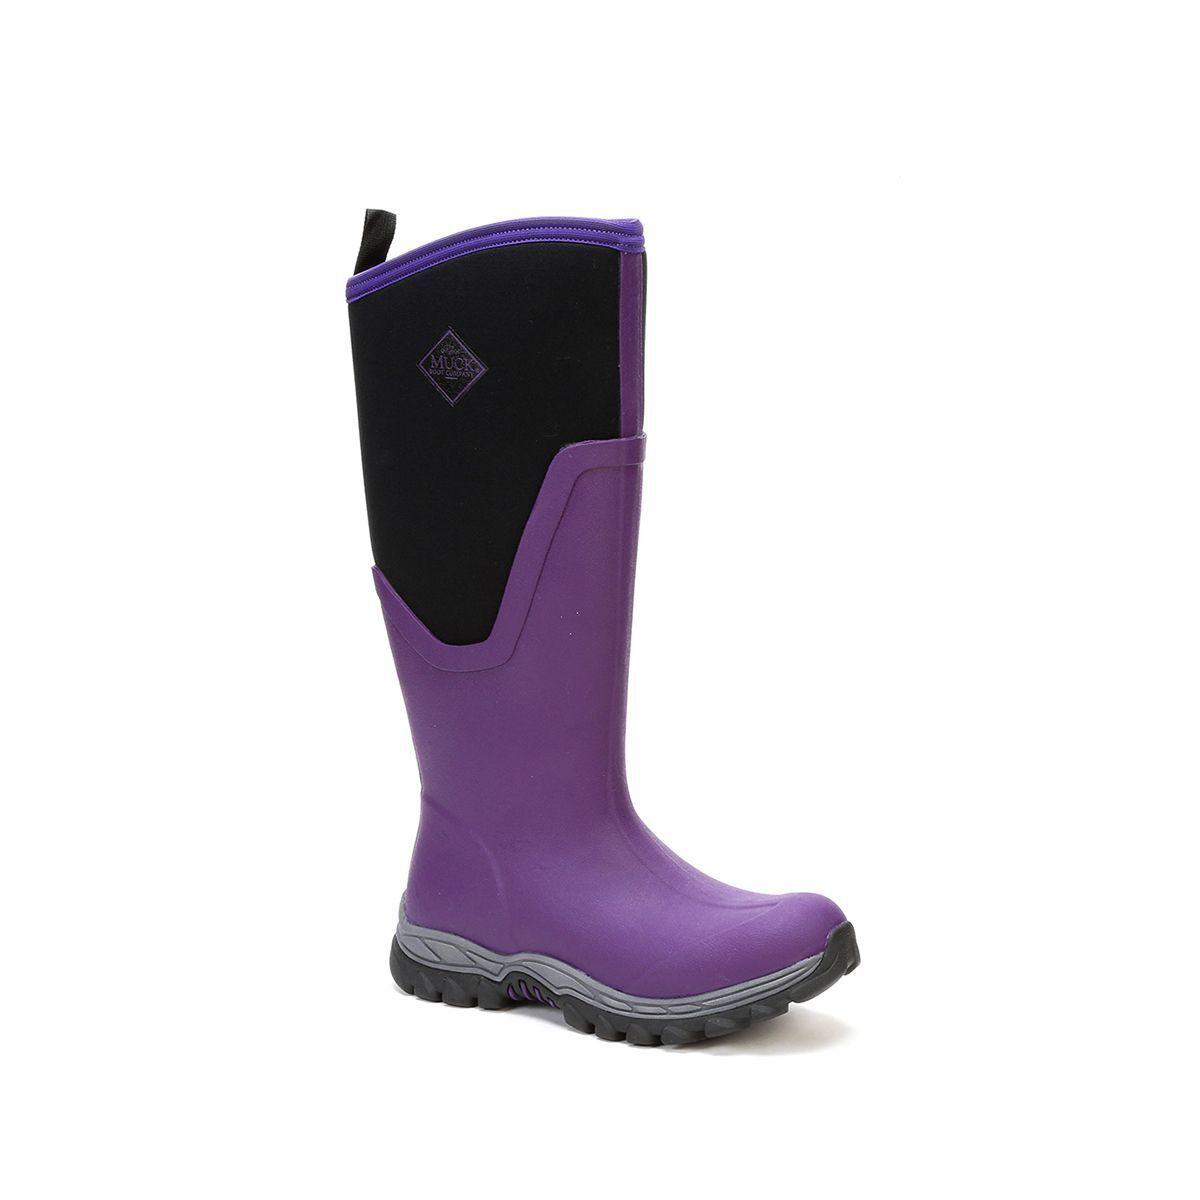 Muck botas Company para mujer Ártico Sport II Alto, Acai púrpura, Goma De Neopreno